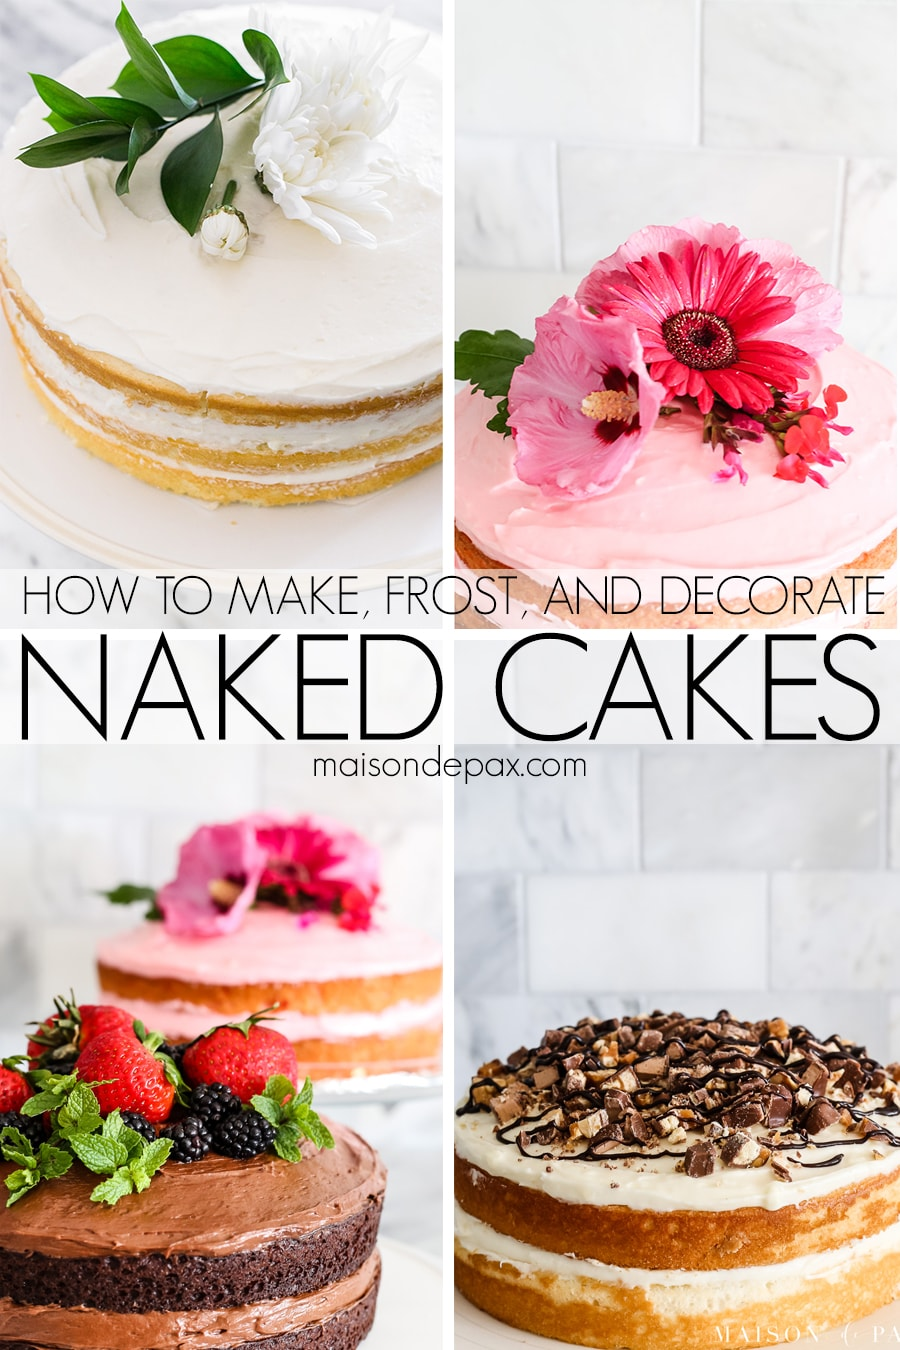 How to make, frost, and decorate naked cakes! Tips and tricks for an easy, beautiful naked cake. #nakedcake #nakedcakerecipe #cakefrosting #howtofrost #cakerecipe #creamcheesefrosting #cakedecorating #whitecake #chocolatecake #strawberrycake